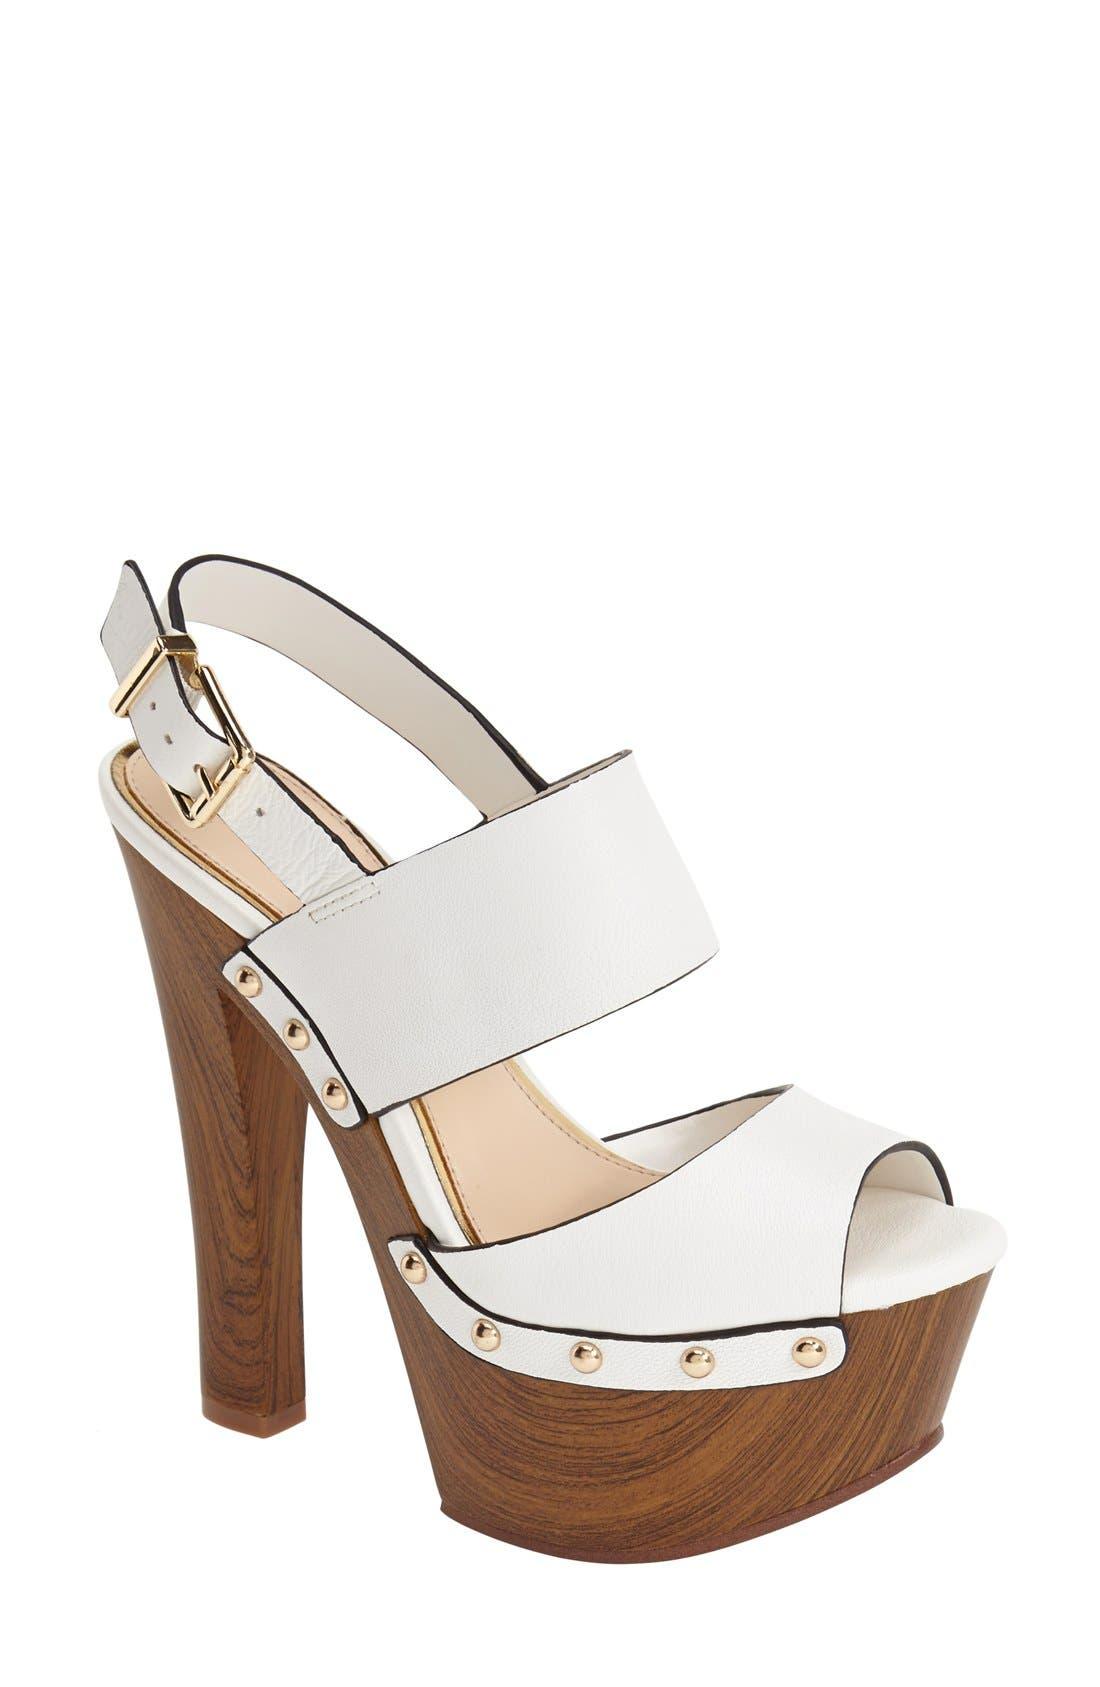 Main Image - Jessica Simpson 'Dallis' Platform Sandal (Women)